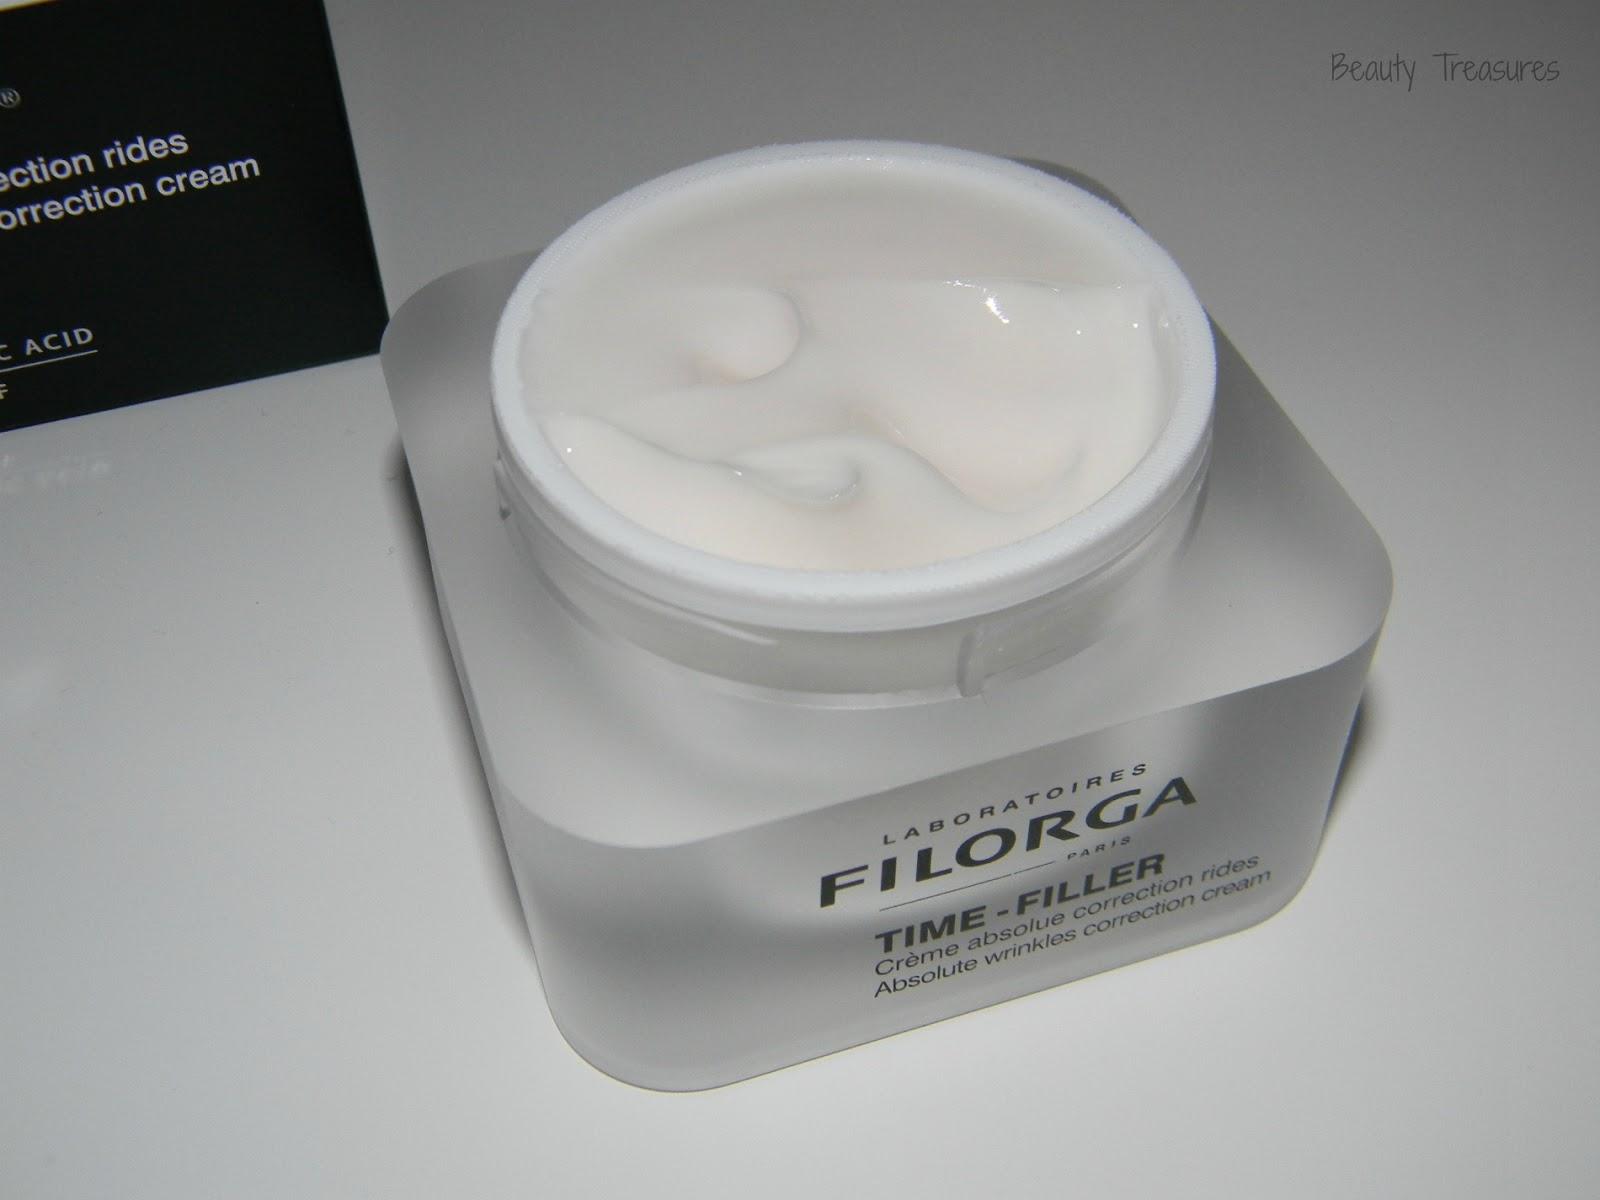 Filorga Time Filler cream